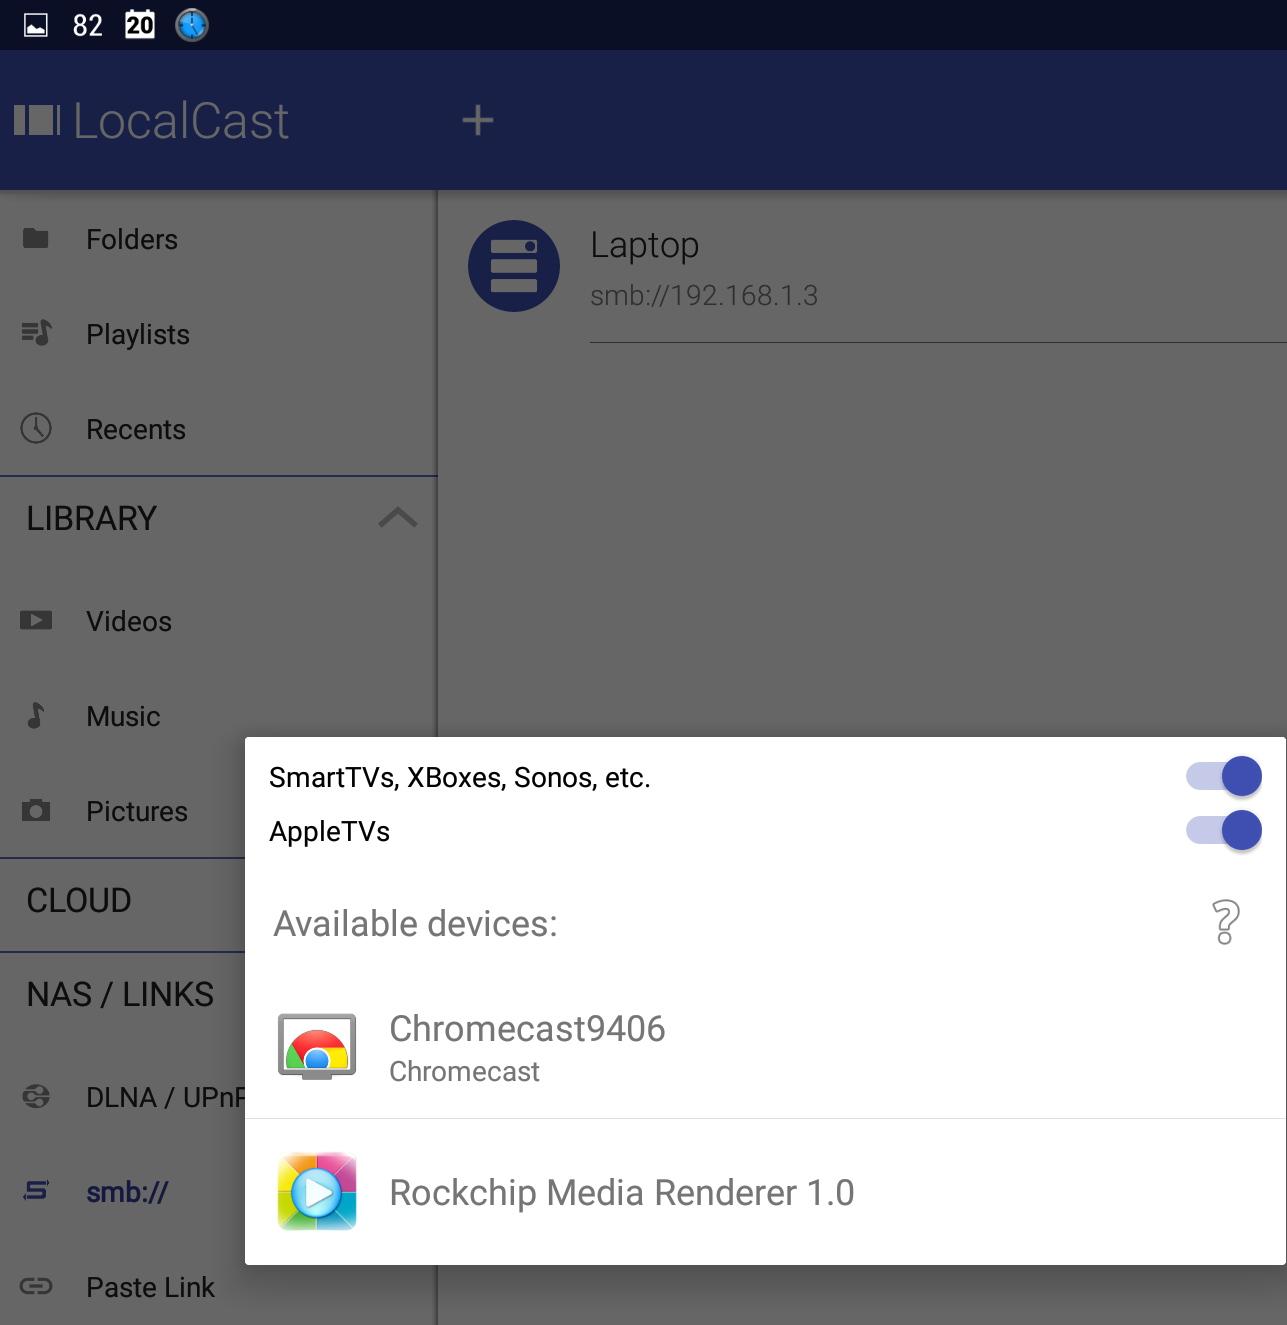 AllCast | LocalCast | Chromecast | Casting app | Android